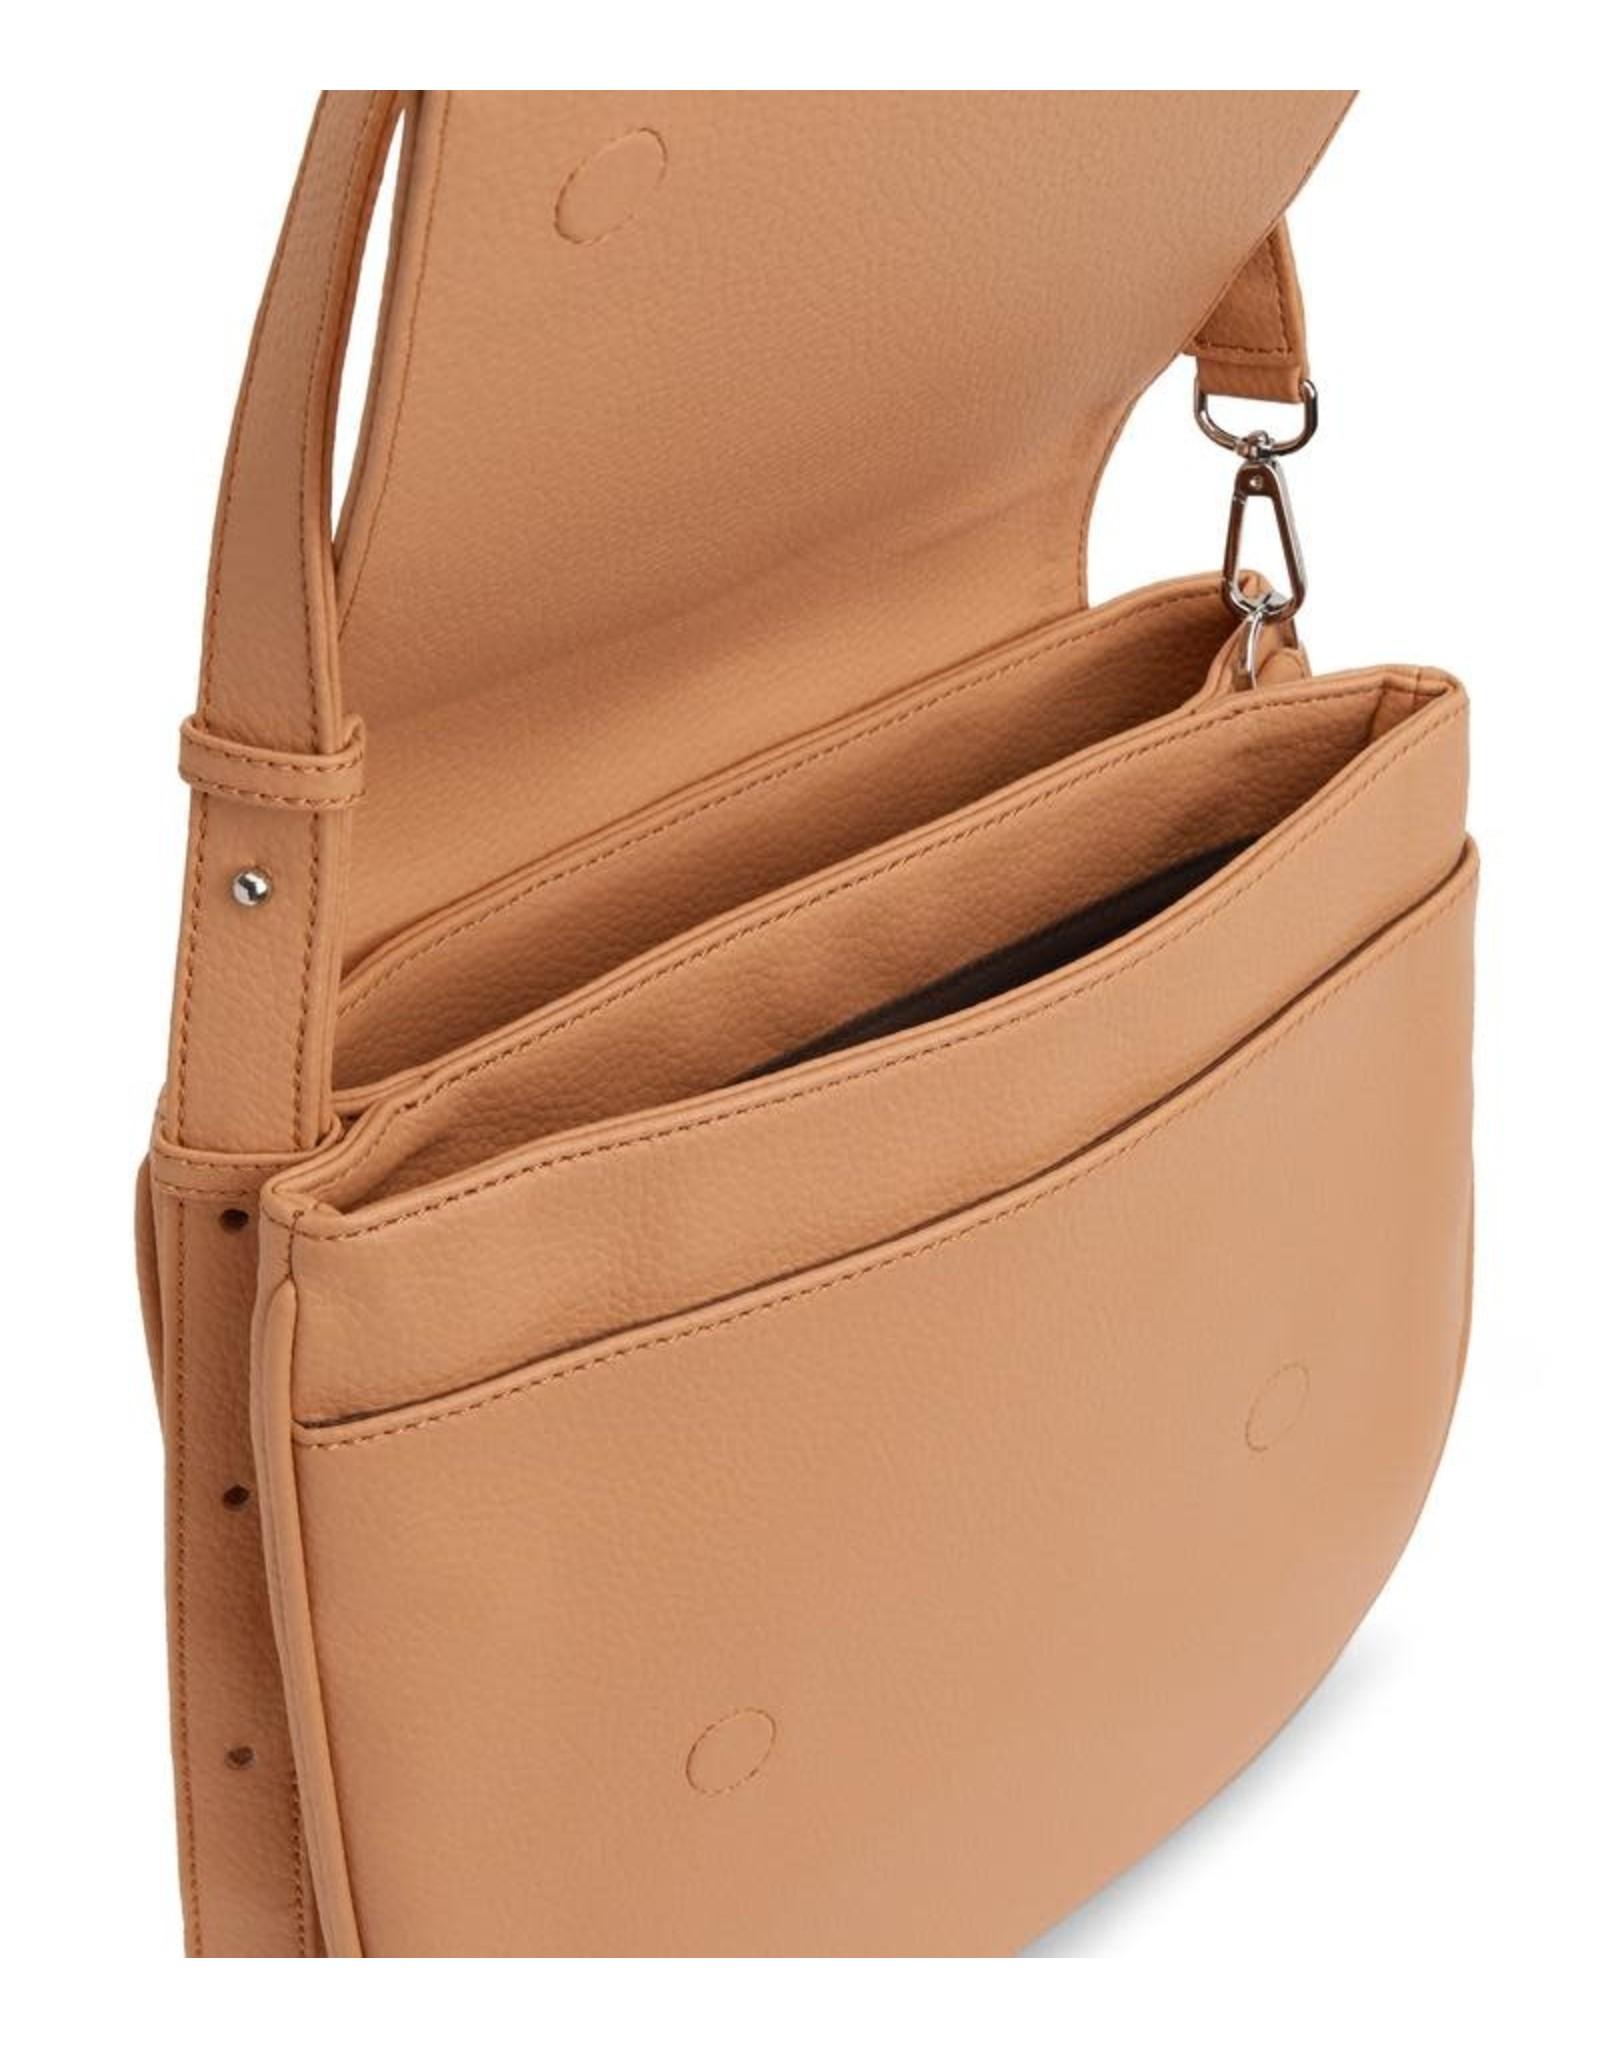 Matt & Nat - Shoulder Bag MatchSlim/Melon